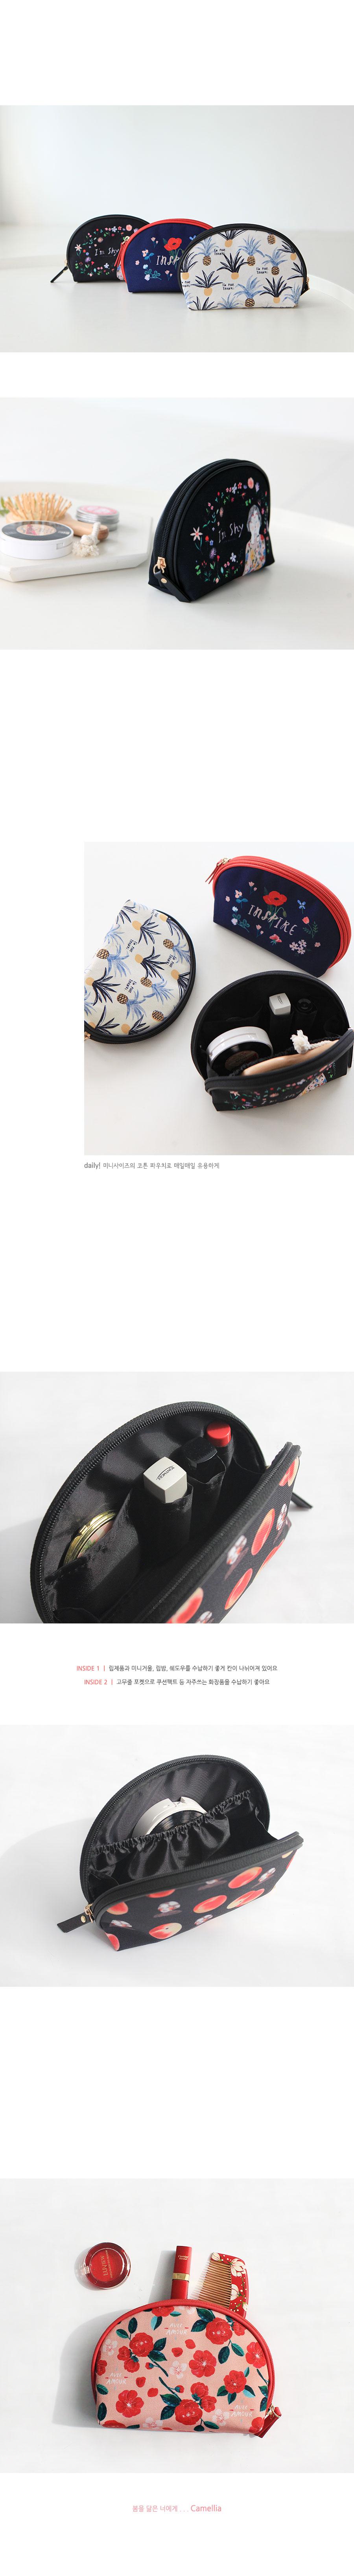 Rim 솜솜 메이크업 파우치 - Camellia - 위드앨리스, 15,800원, 화장품파우치, 애나멜/인조가죽